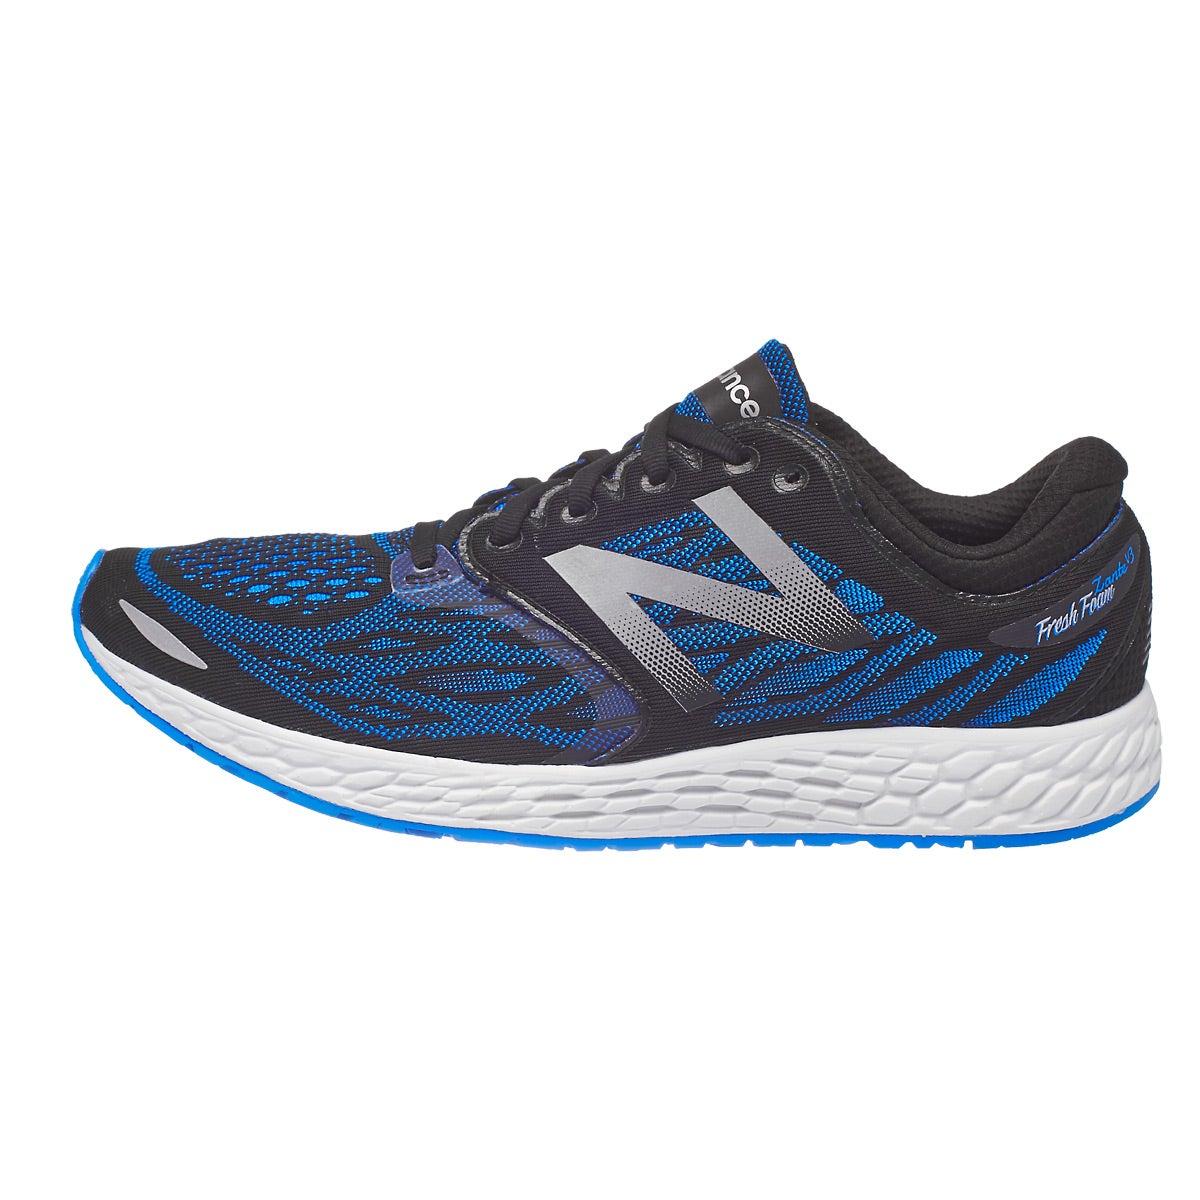 New Balance Fresh Foam Zante v3 Men's Shoe Black/Blue 360 ...